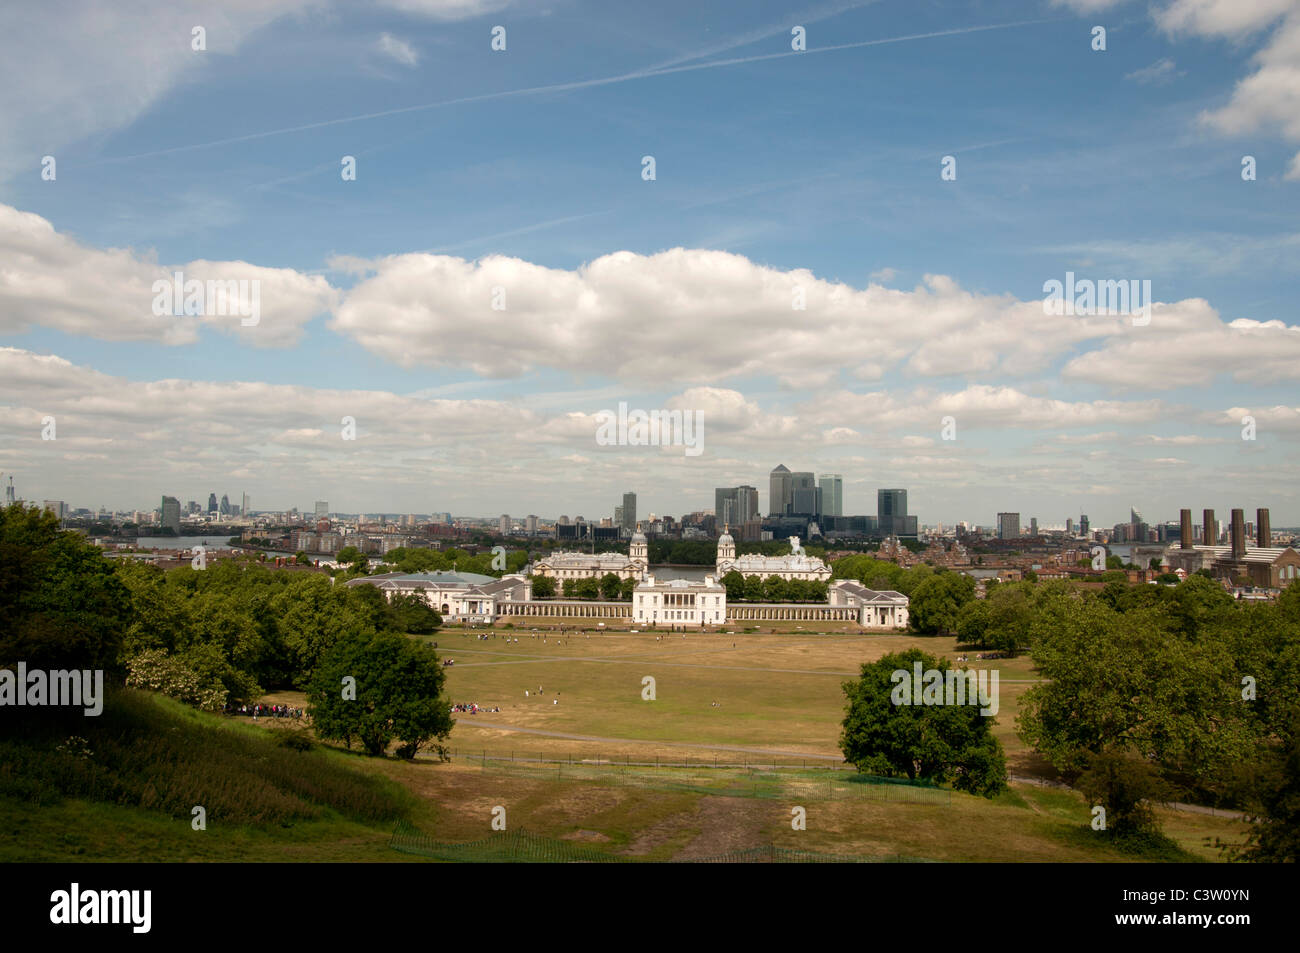 Greenwich royal park London England UK - Stock Image